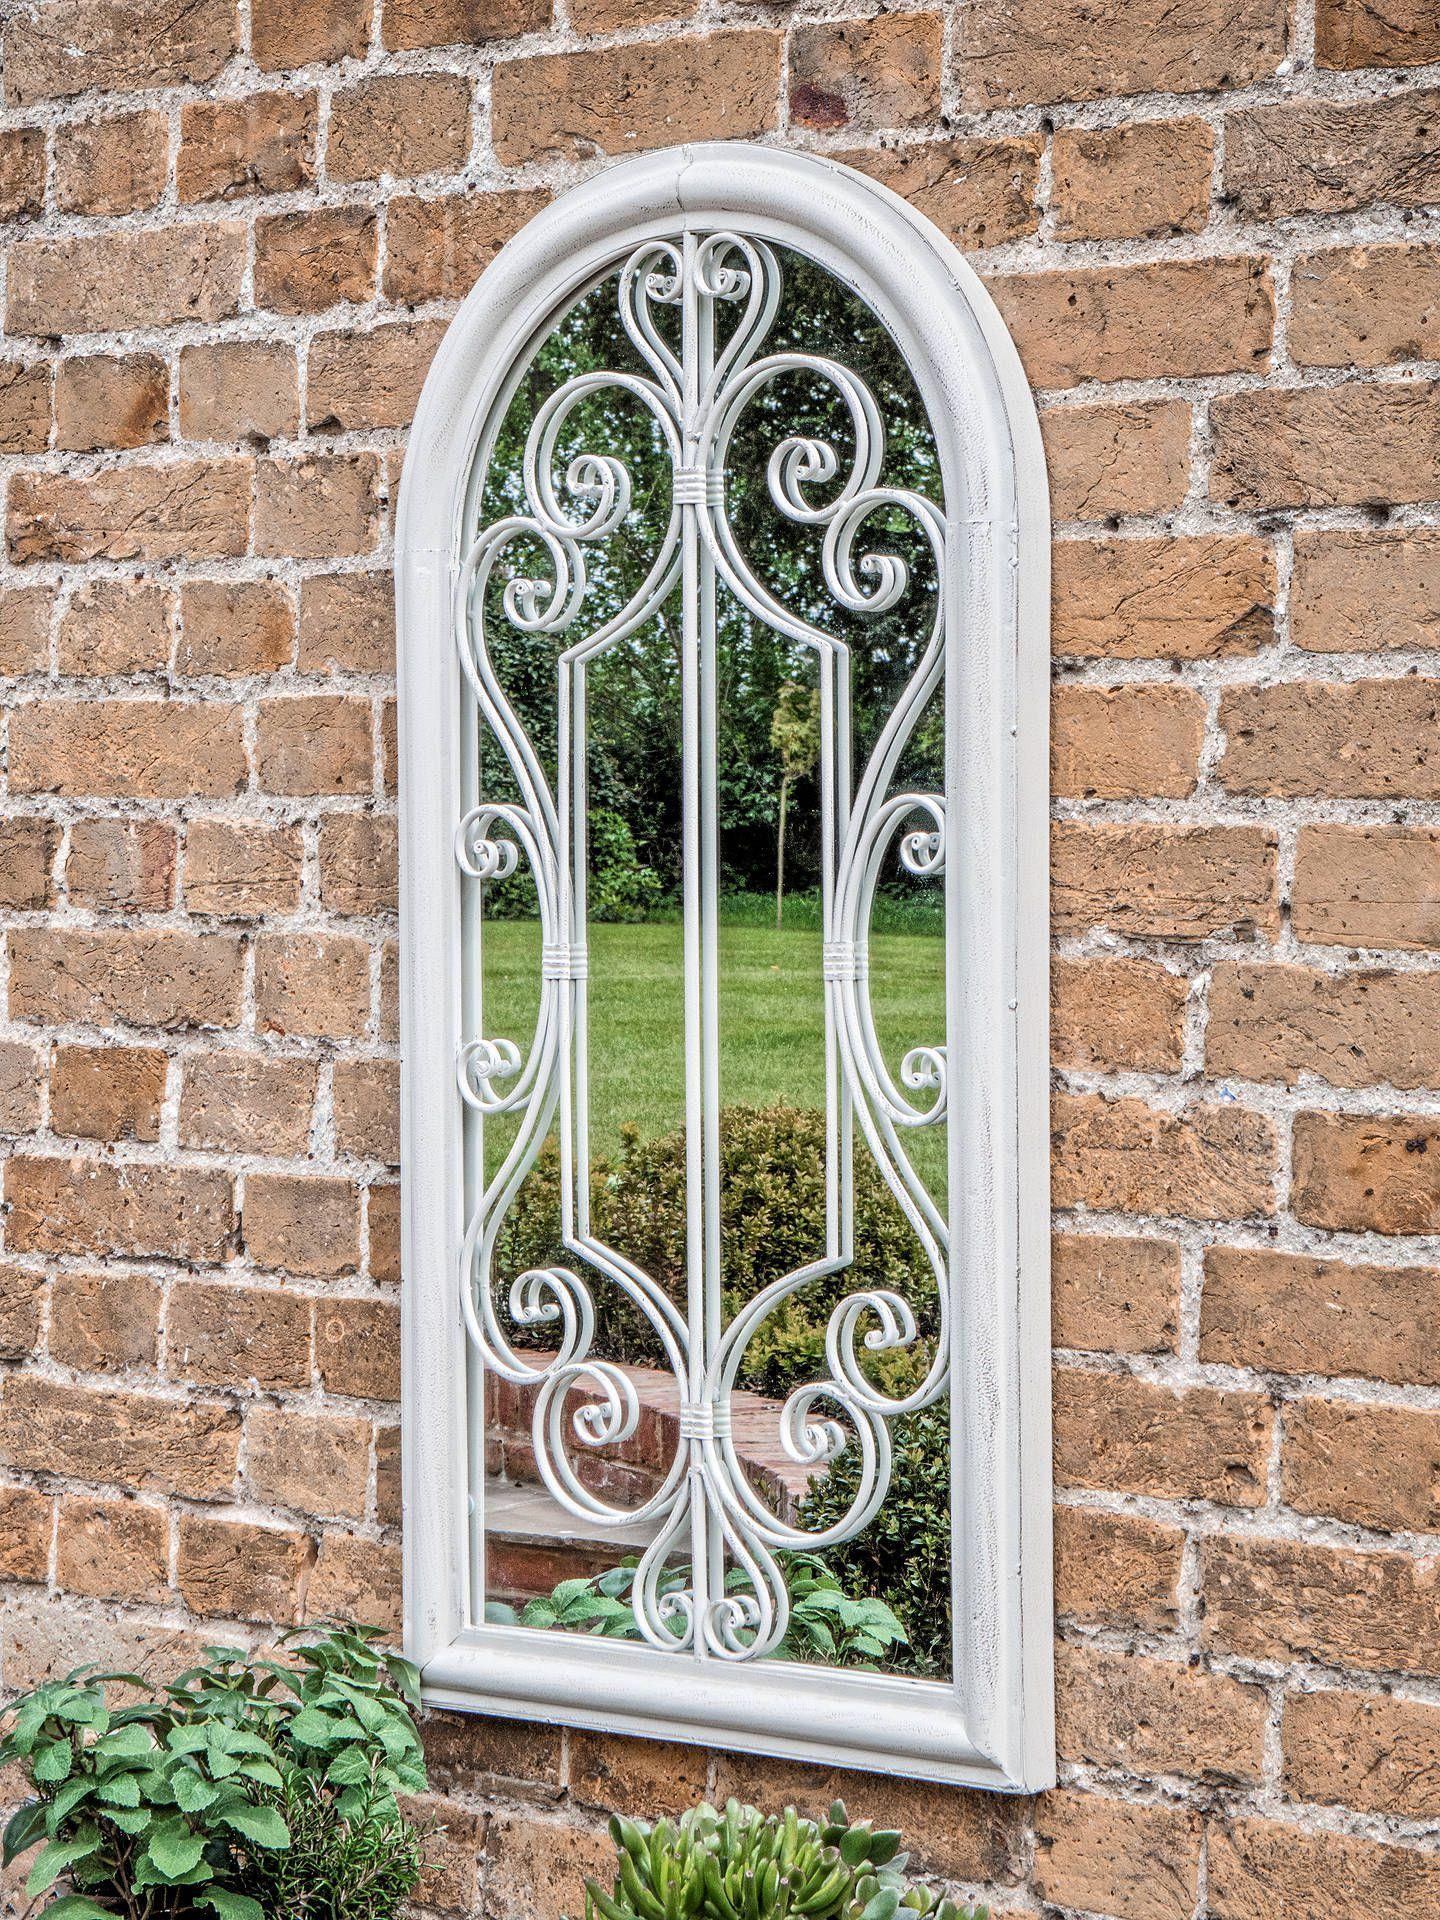 Fleura Outdoor Garden Wall Ornate Arched Mirror 96 5 X 49cm Antique Ivory